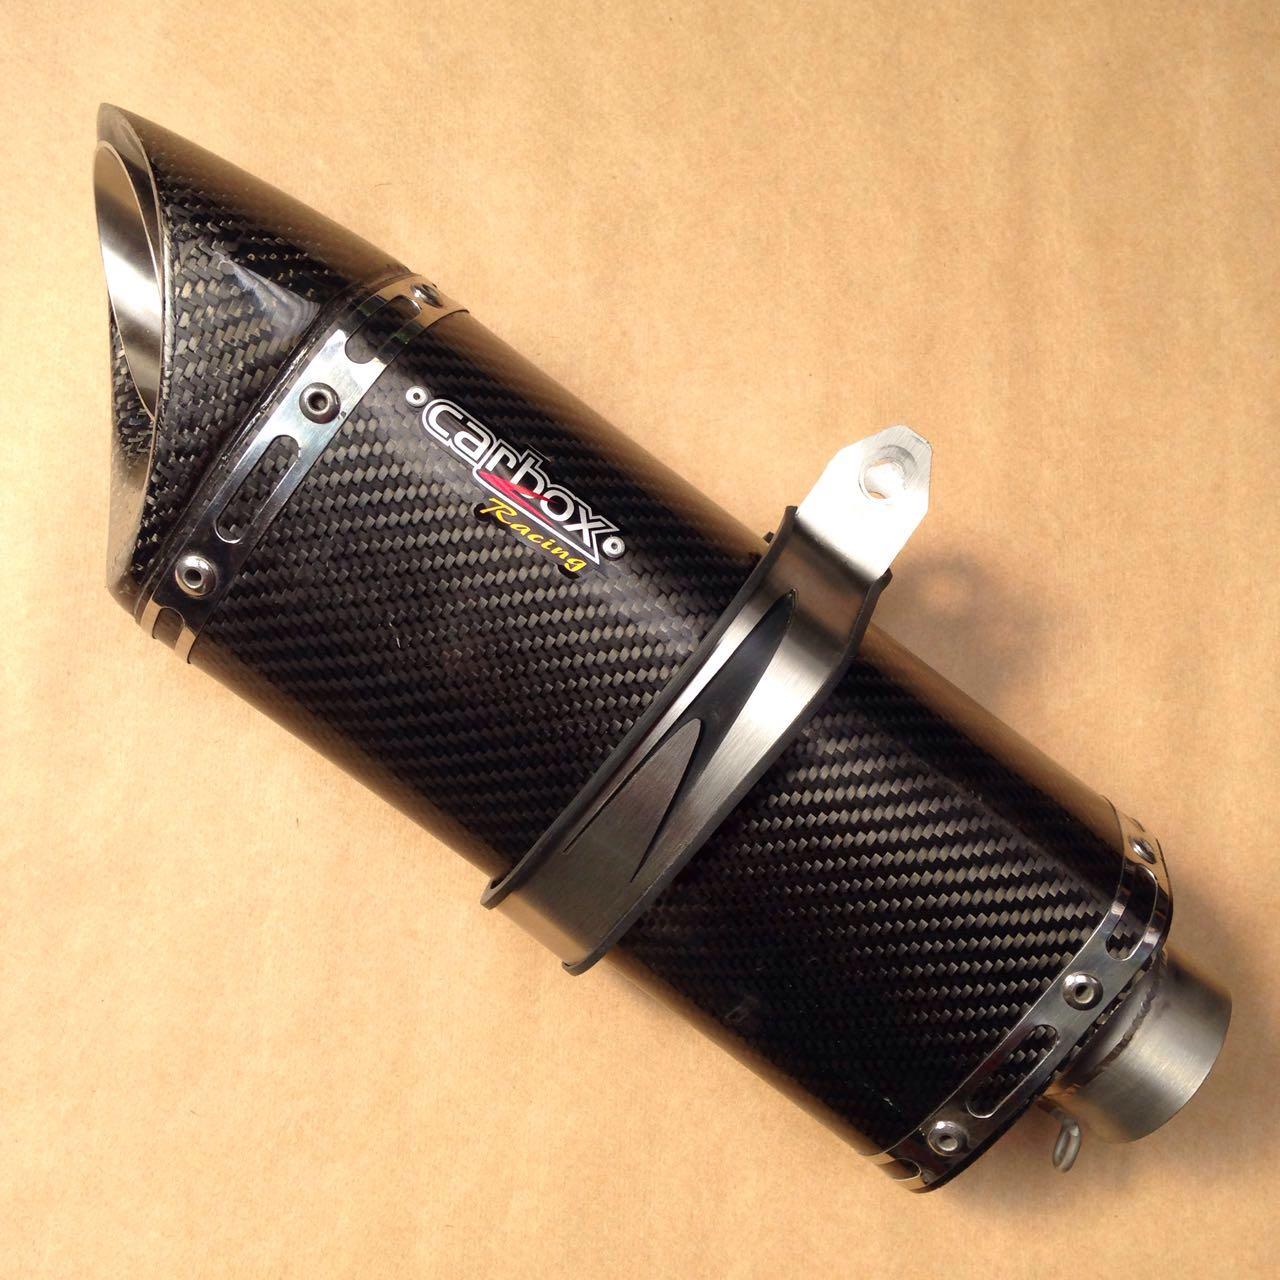 Ponteira Escape Scorpion S725 Carbon Full 4x2x1 - Hornet 600